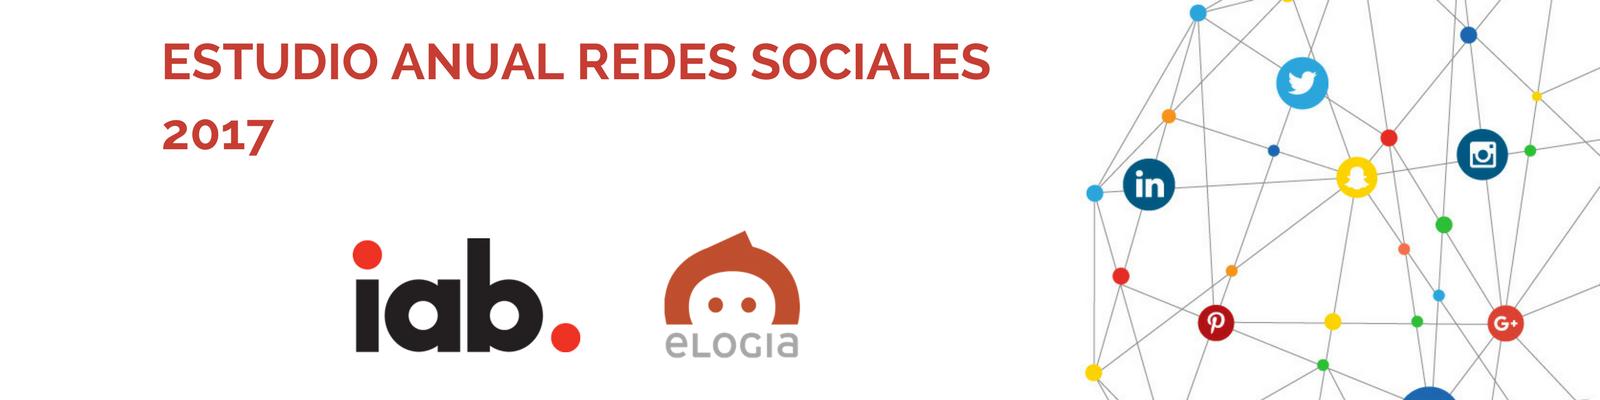 iab-estudio-redes-sociales.png